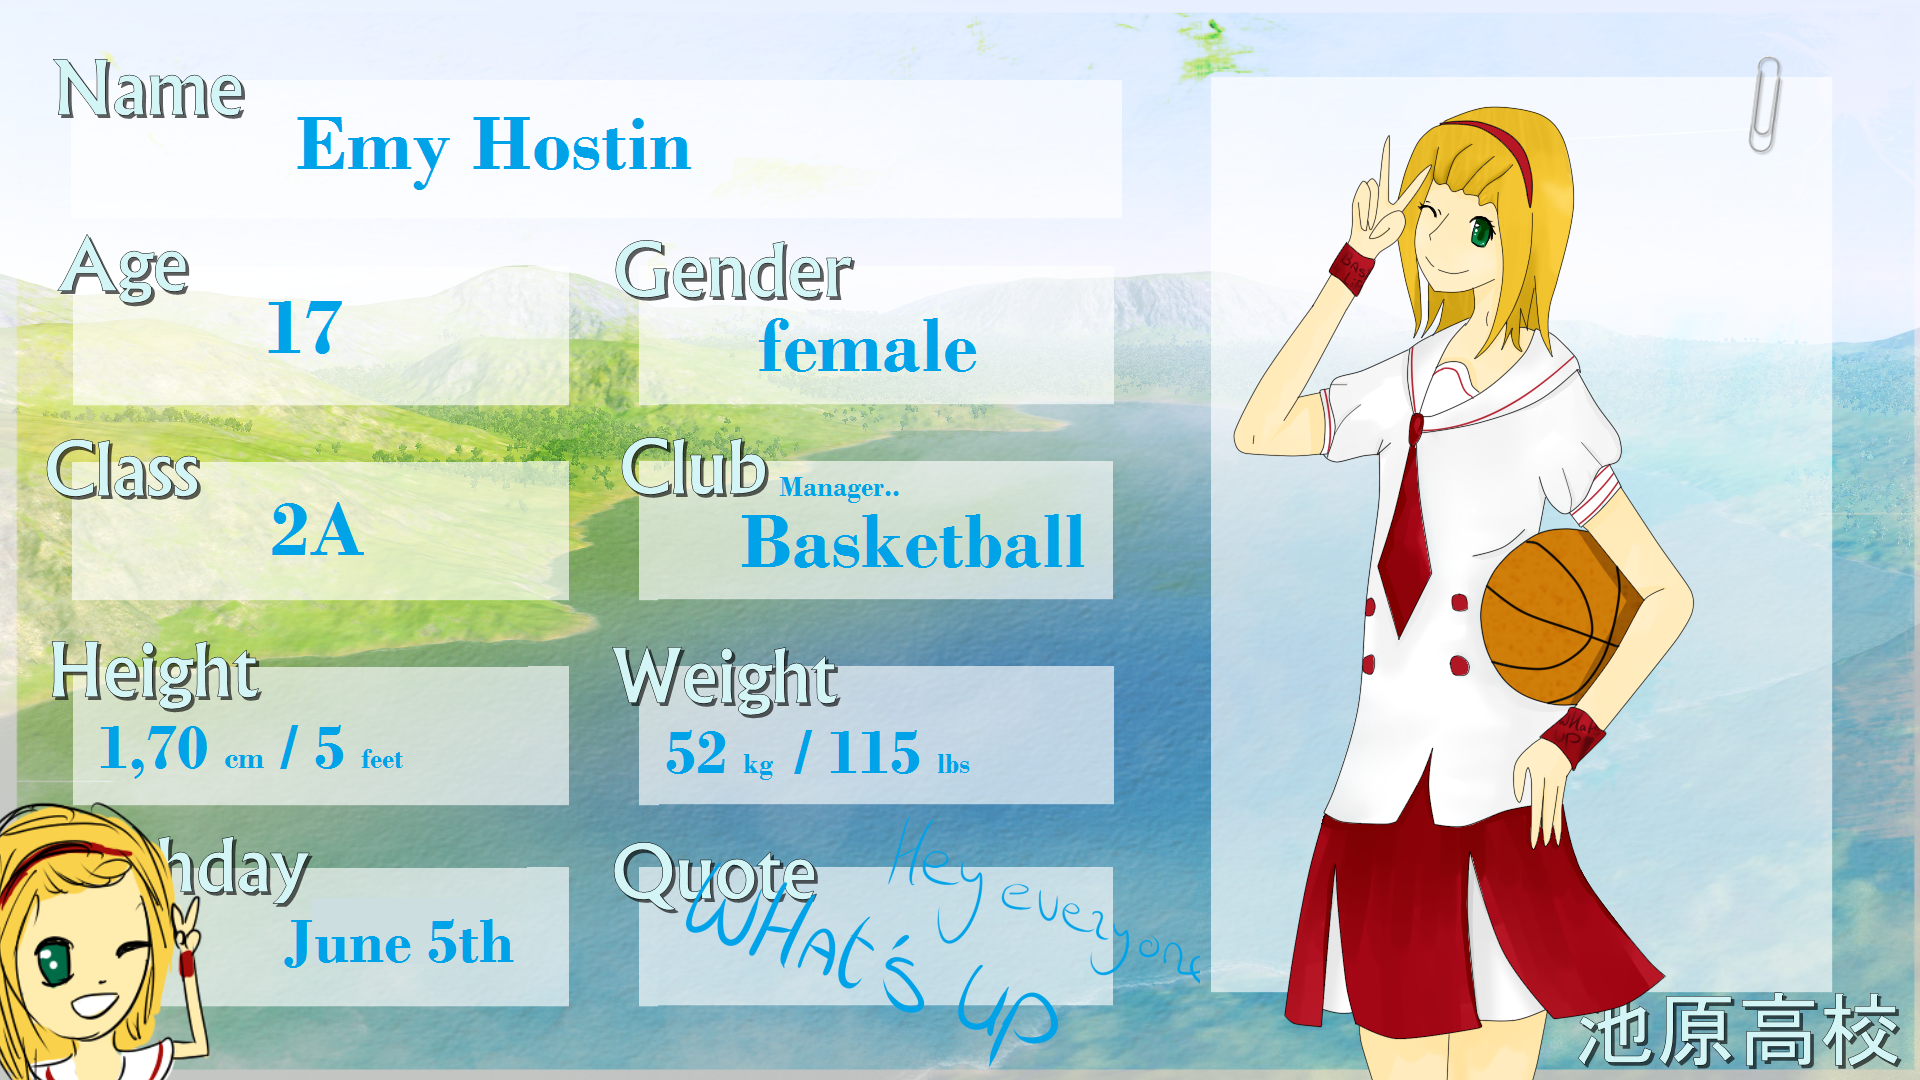 Ikehara-High App, Emy Hostin by mira00000